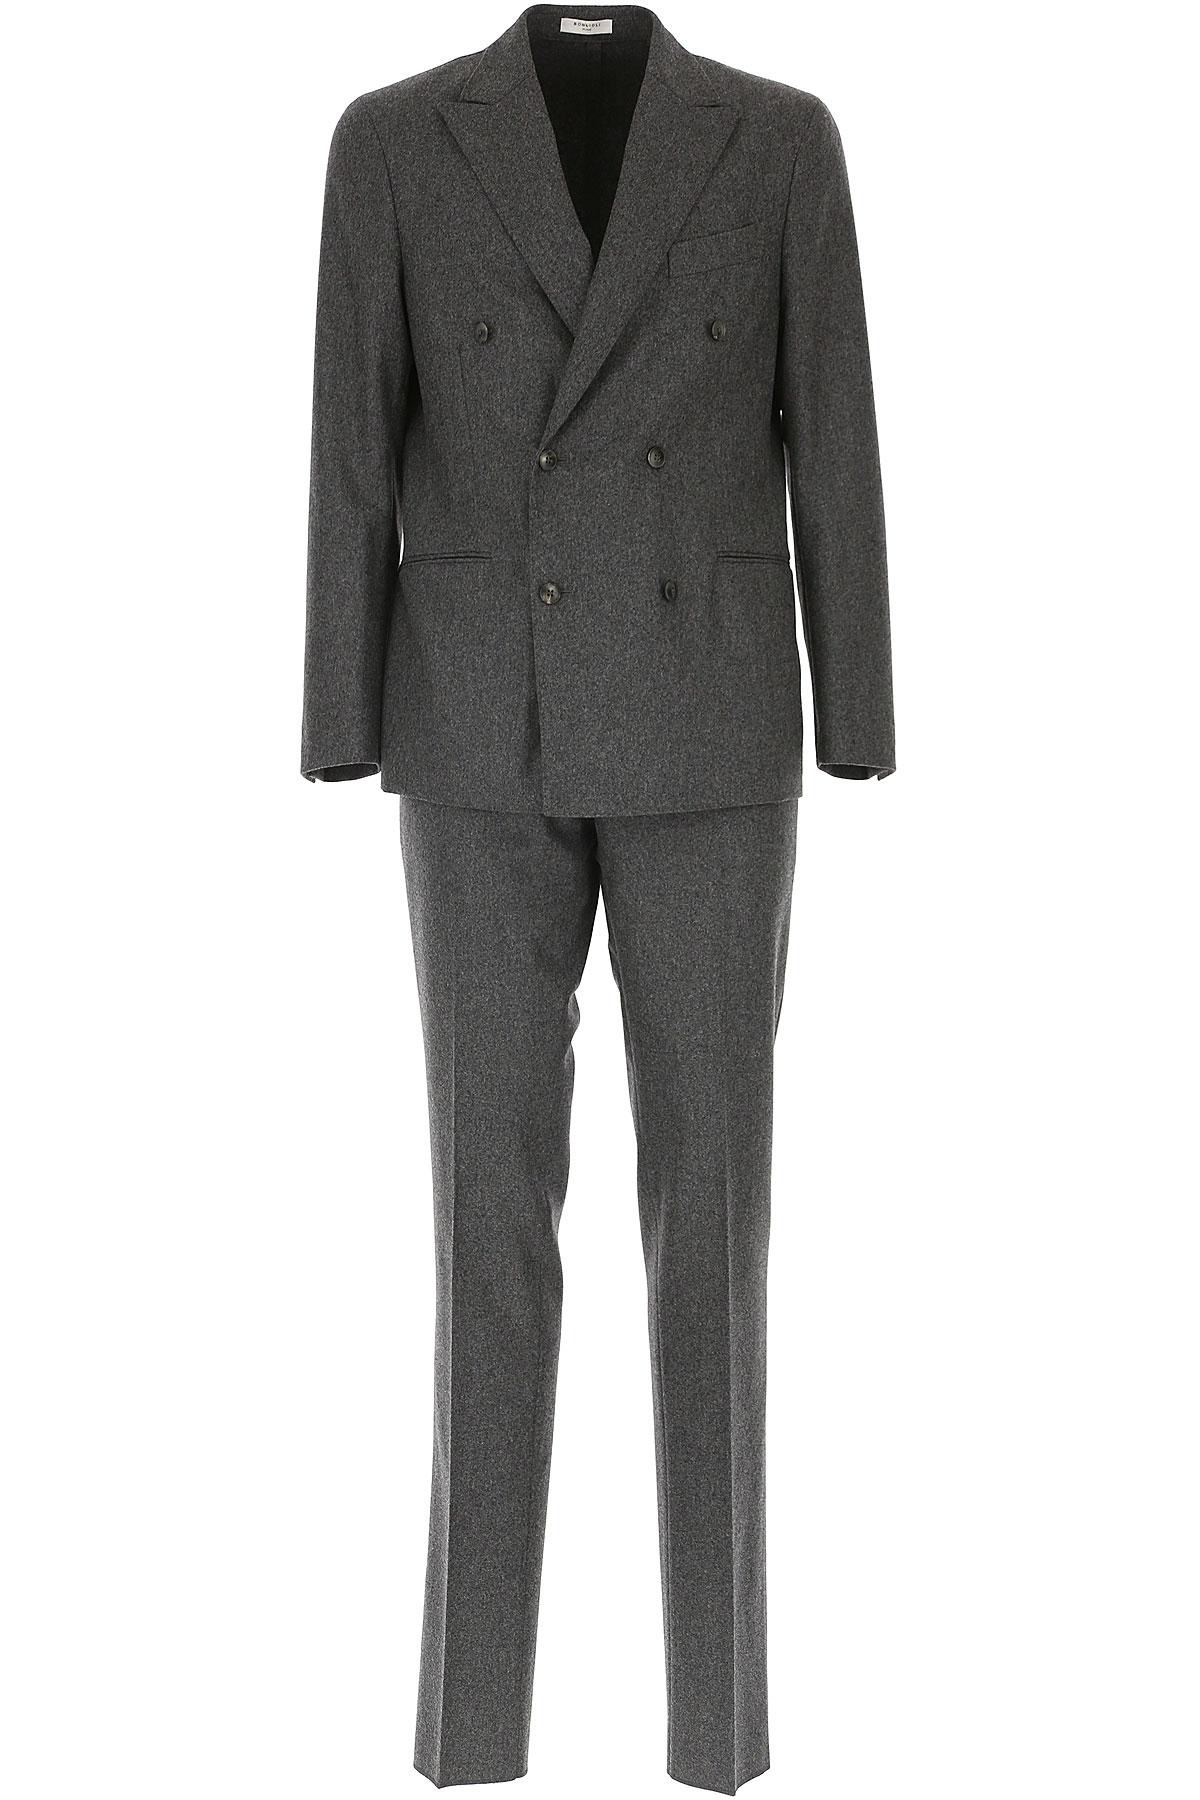 Image of Boglioli Men's Suit, Grey, Wool, 2017, L M XL